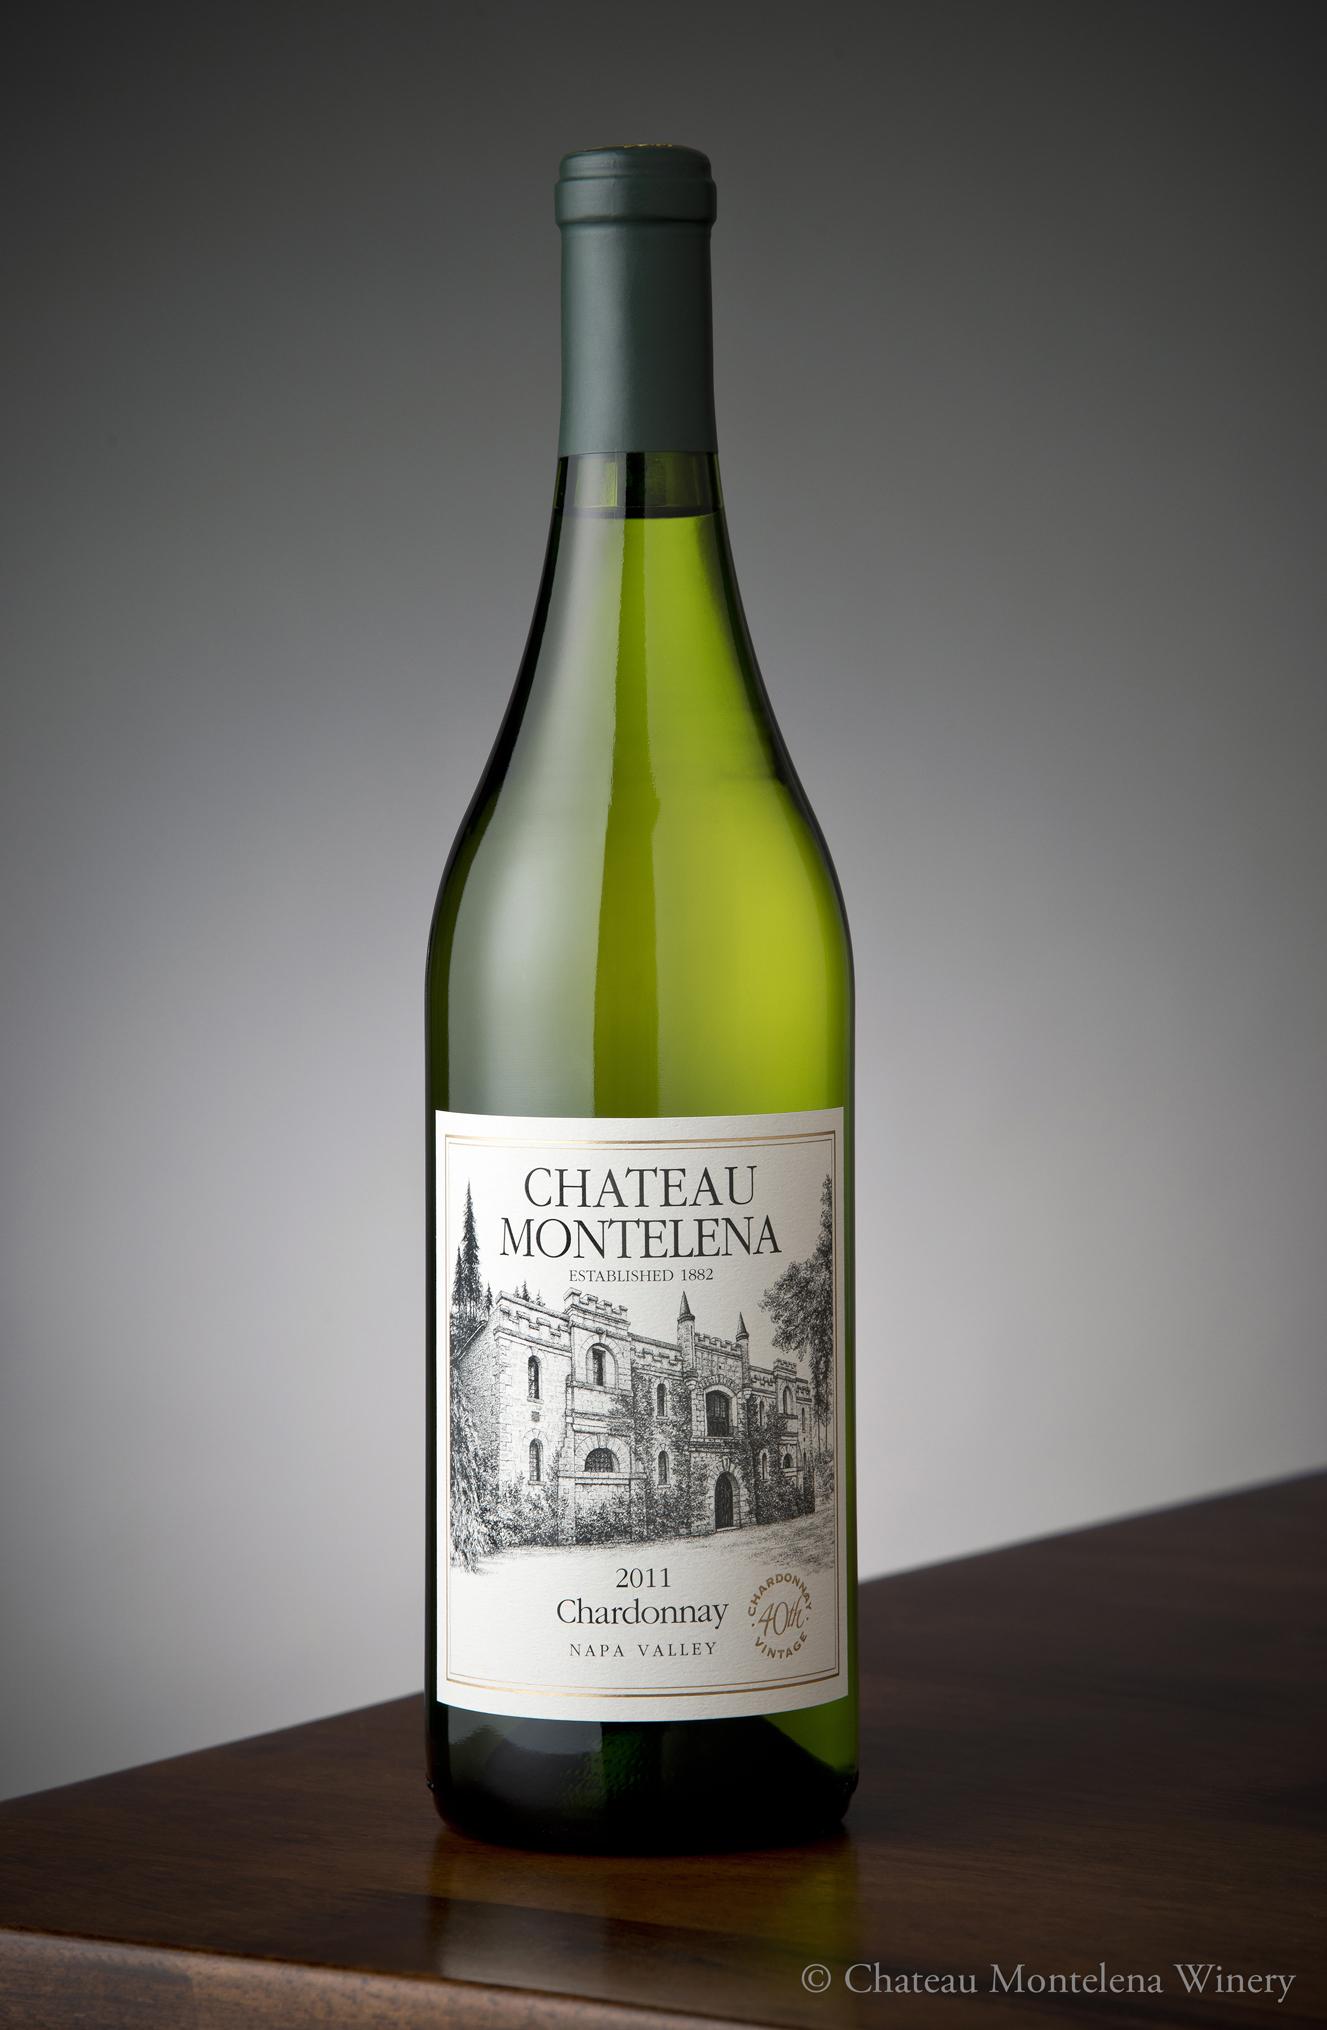 2011 Chateau Montelena Chardonnay Napa Valley